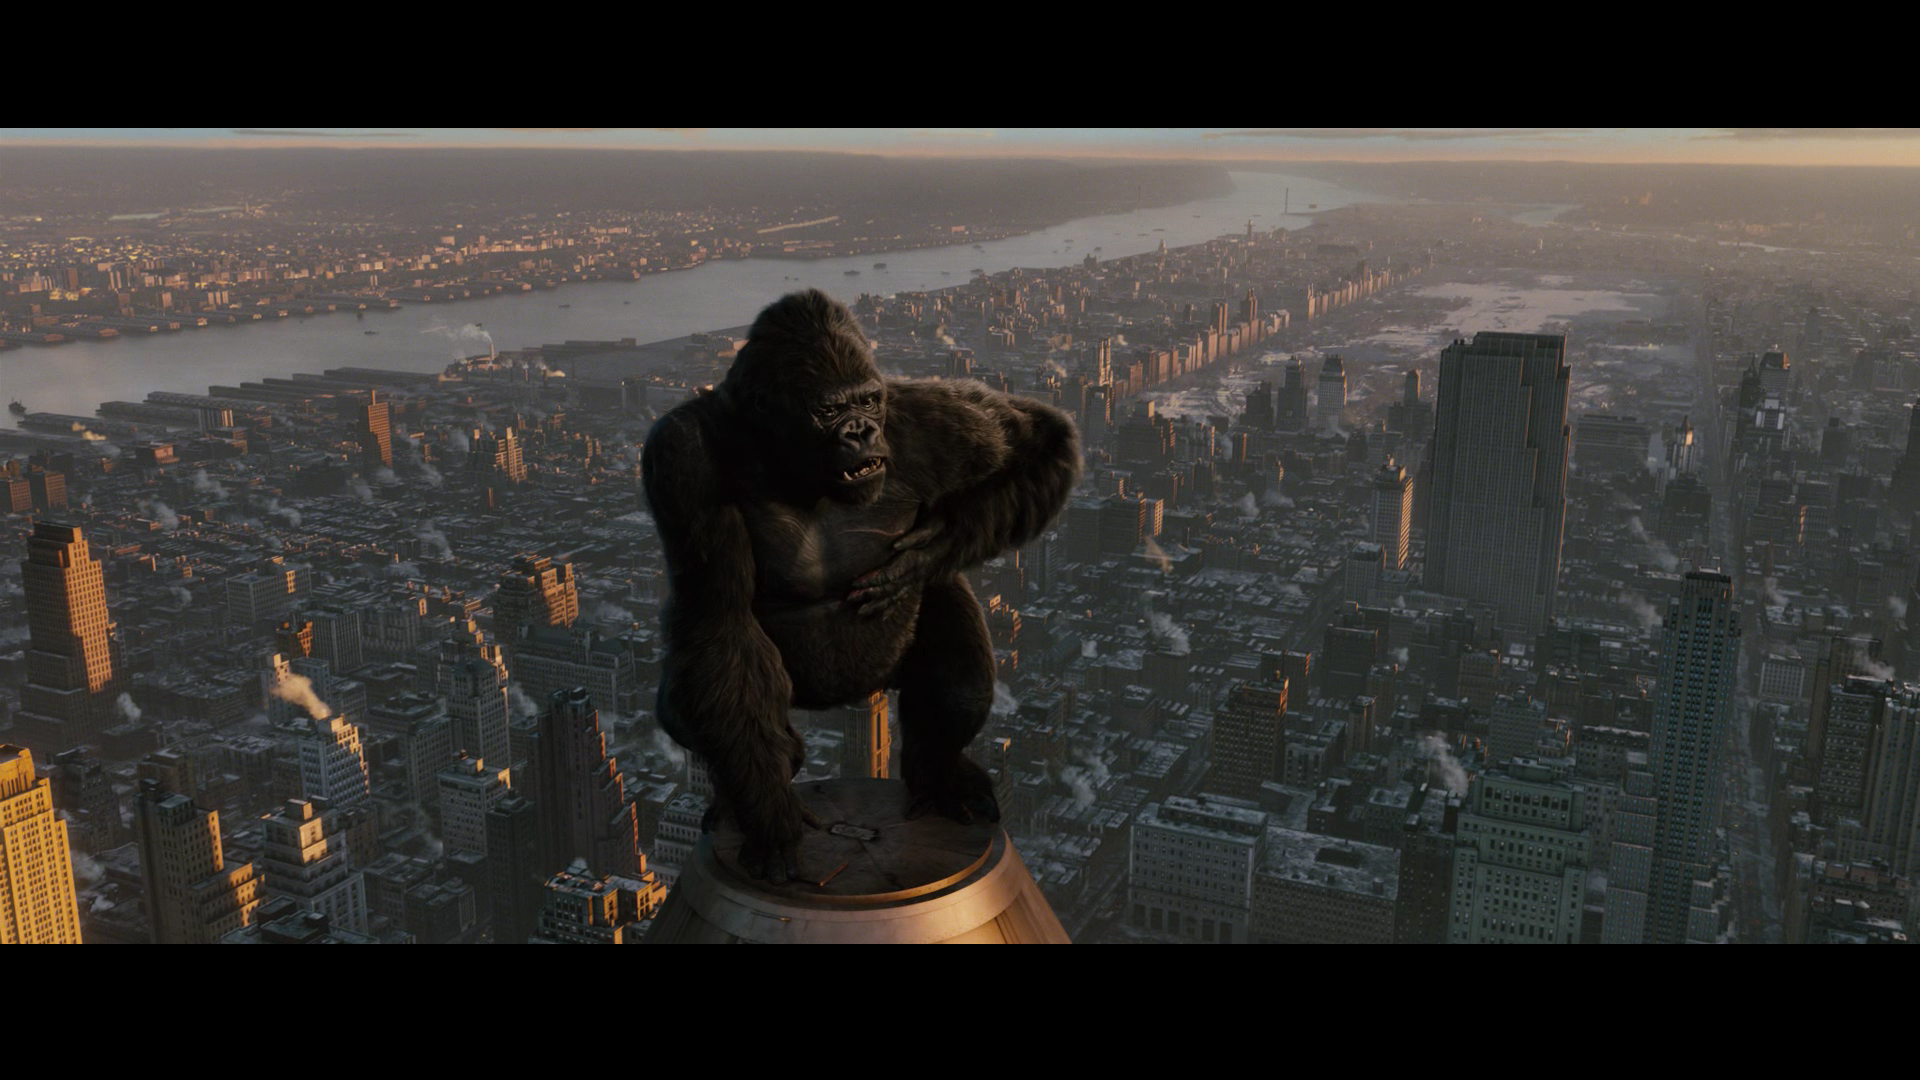 Kong 2005 Worms King kong. serenity King Kong Empire State Building ... King Kong Empire State Building With Girl